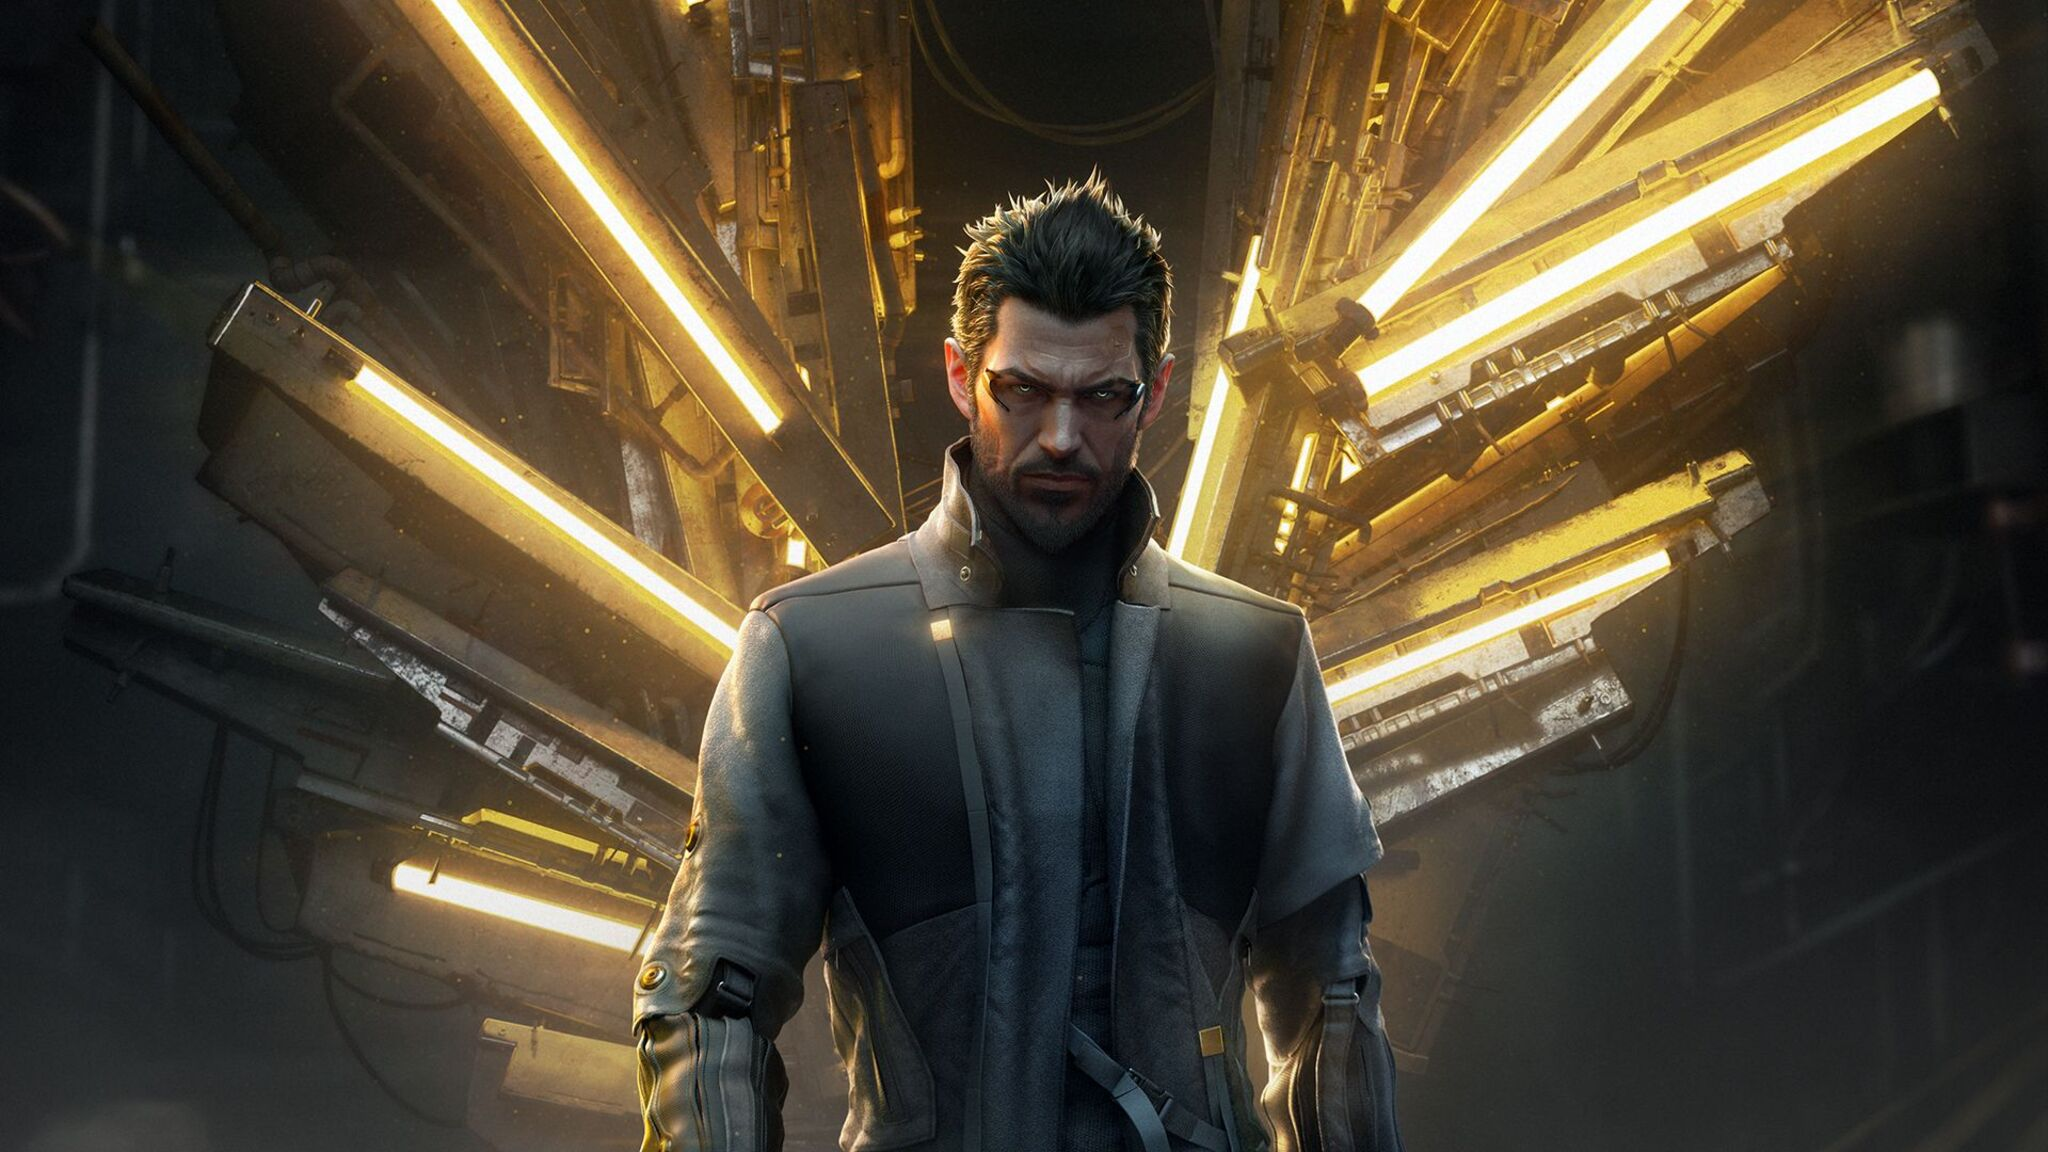 2048x1152 Deus Ex Mankind Divided Hd 2048x1152 Resolution Hd 4k